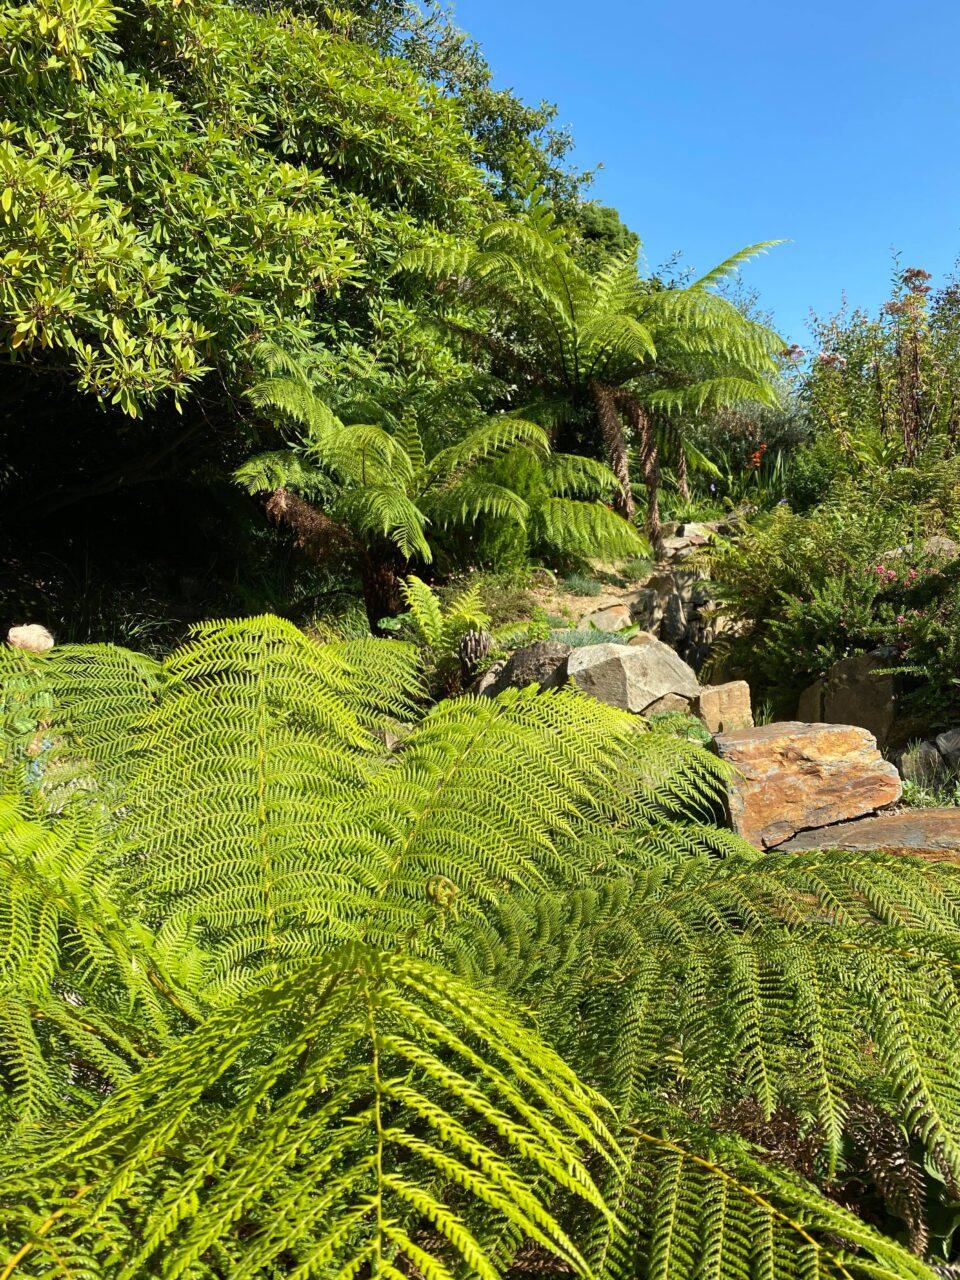 a large fern and rockery